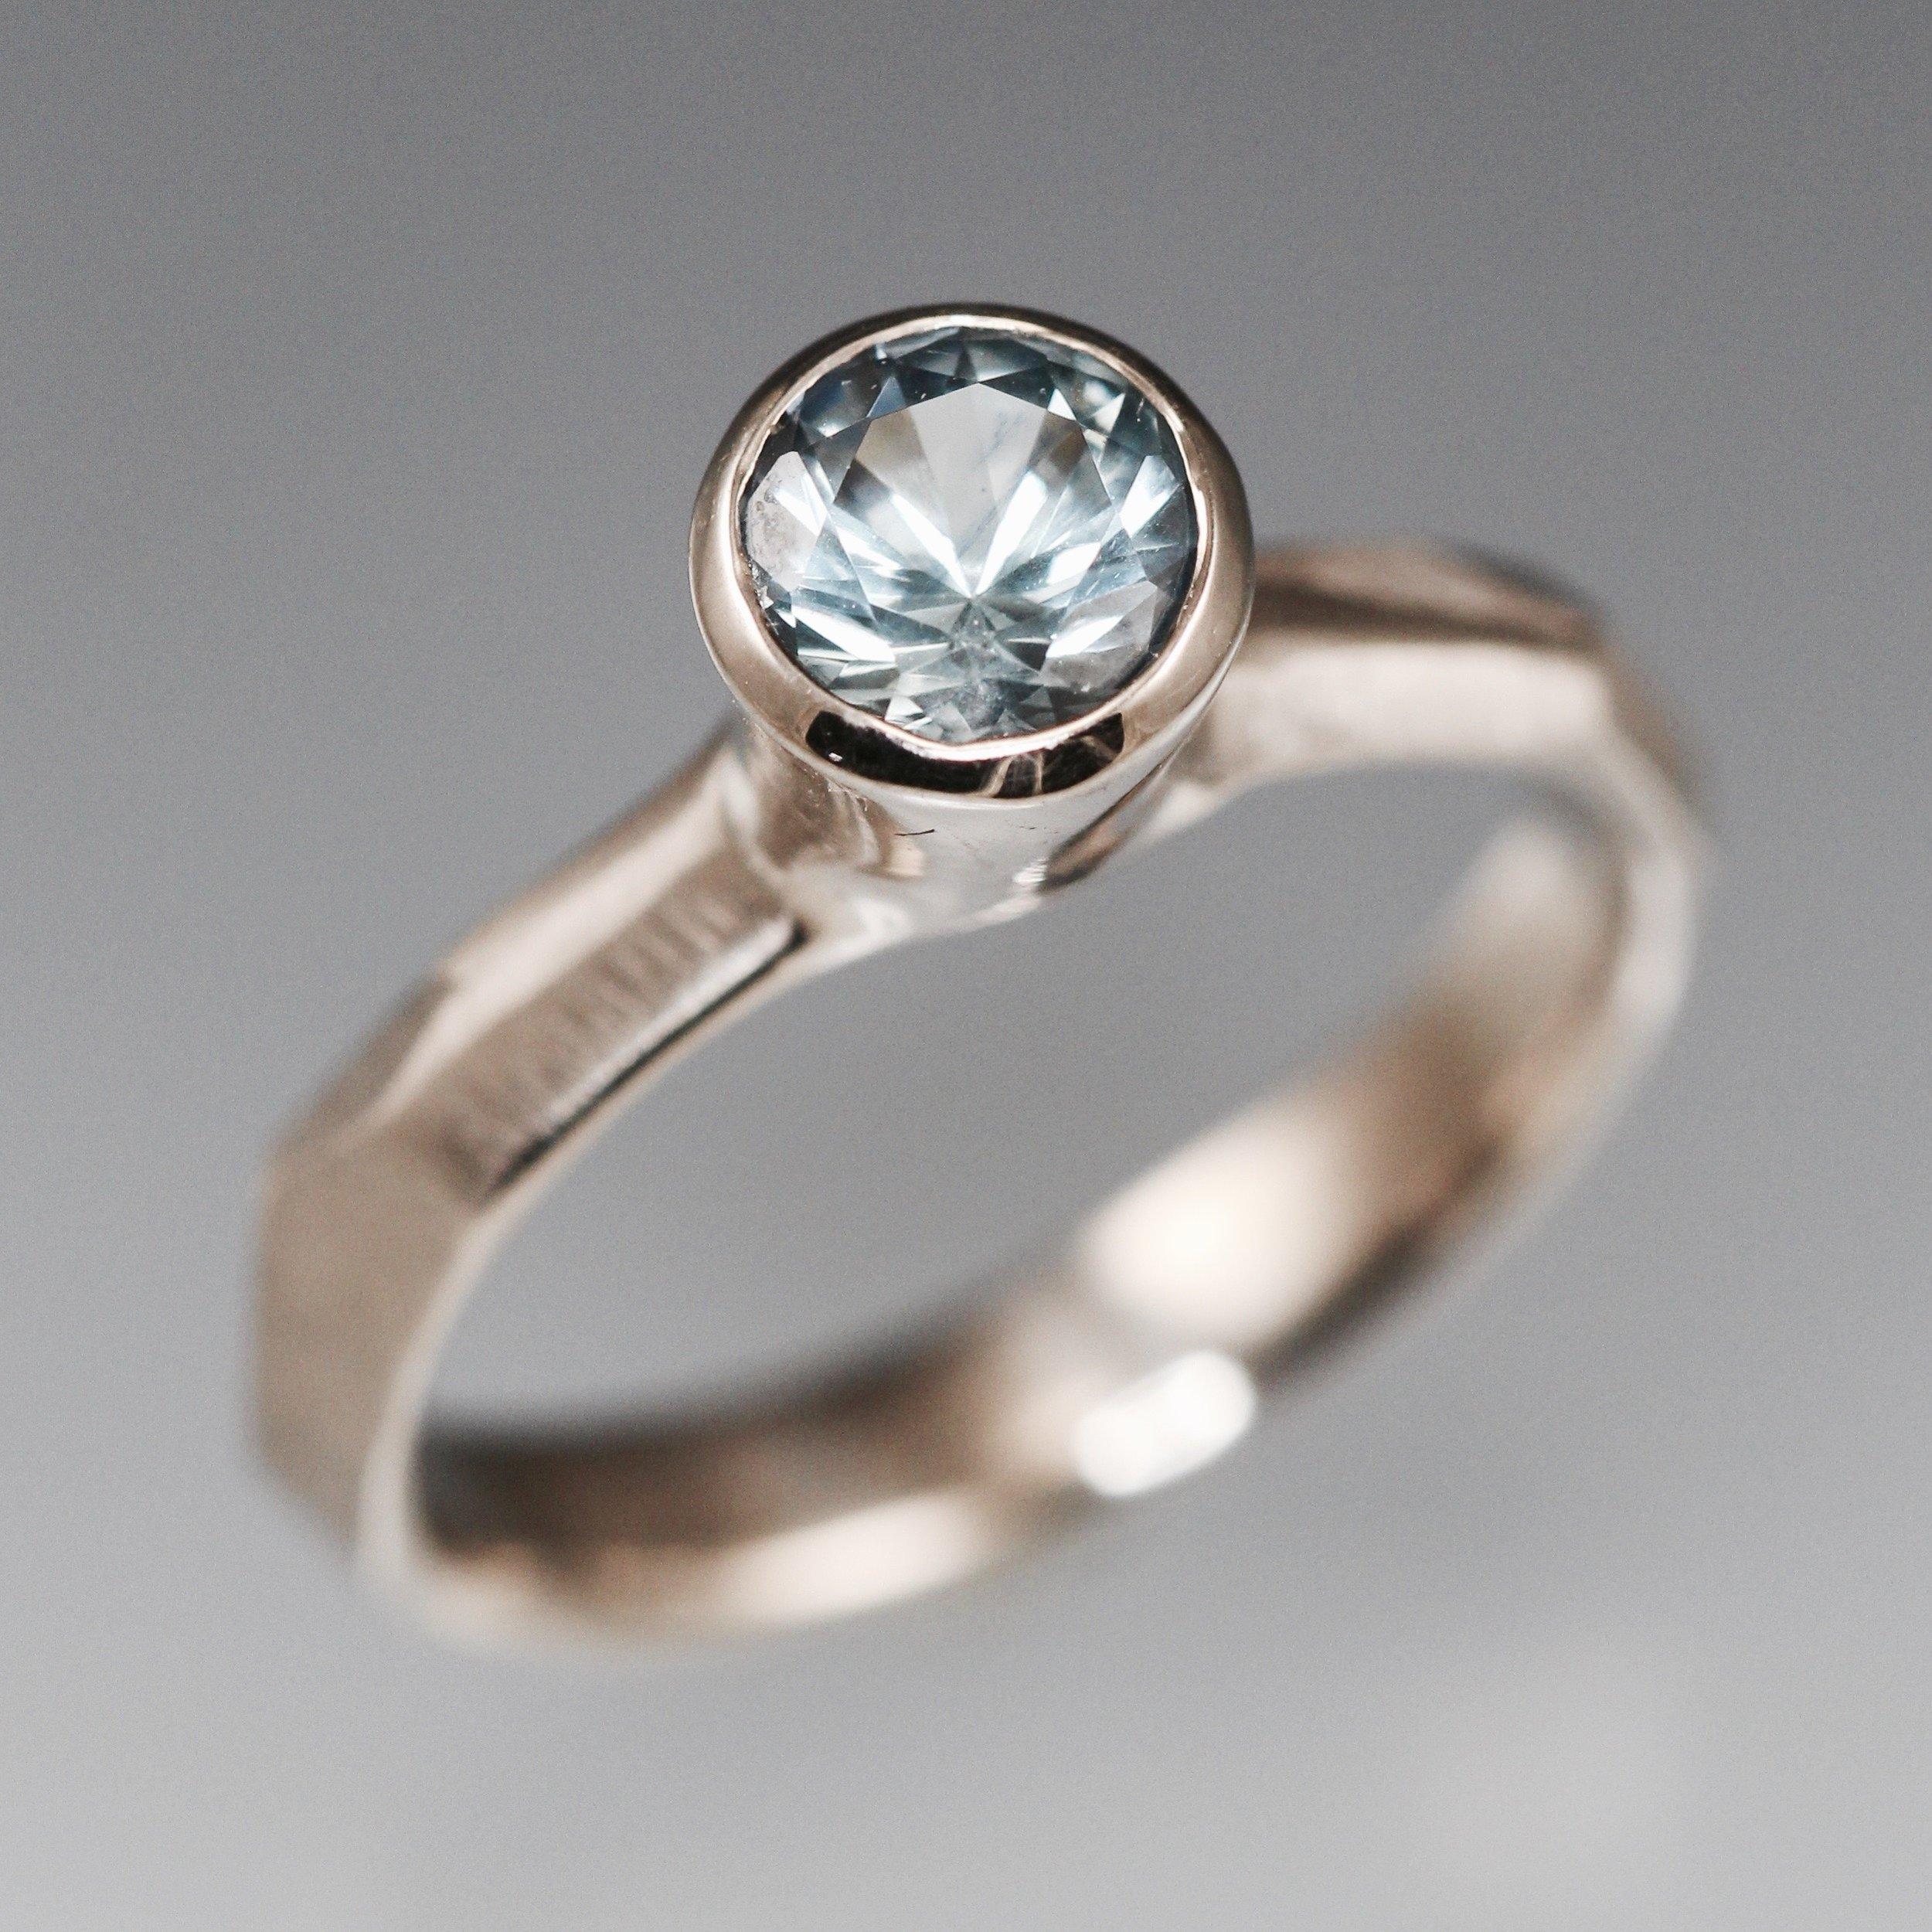 Montana blue sapphire and 14k white palladium gold